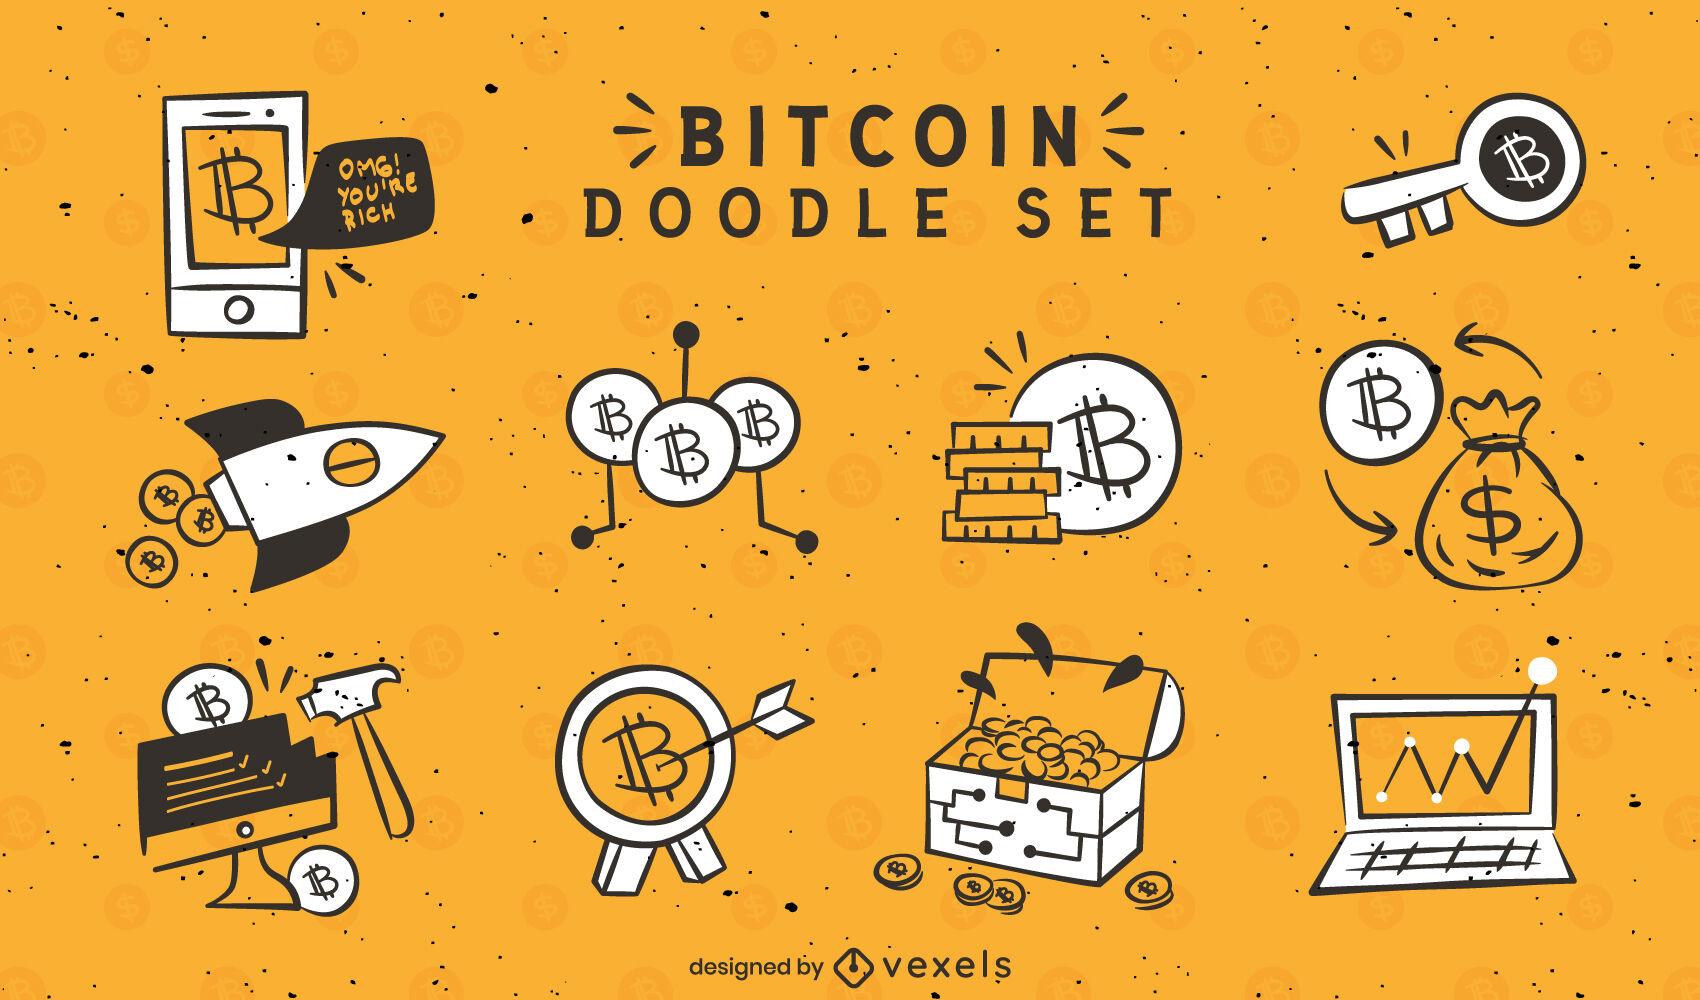 Bitcoin doodle conjunto de elementos